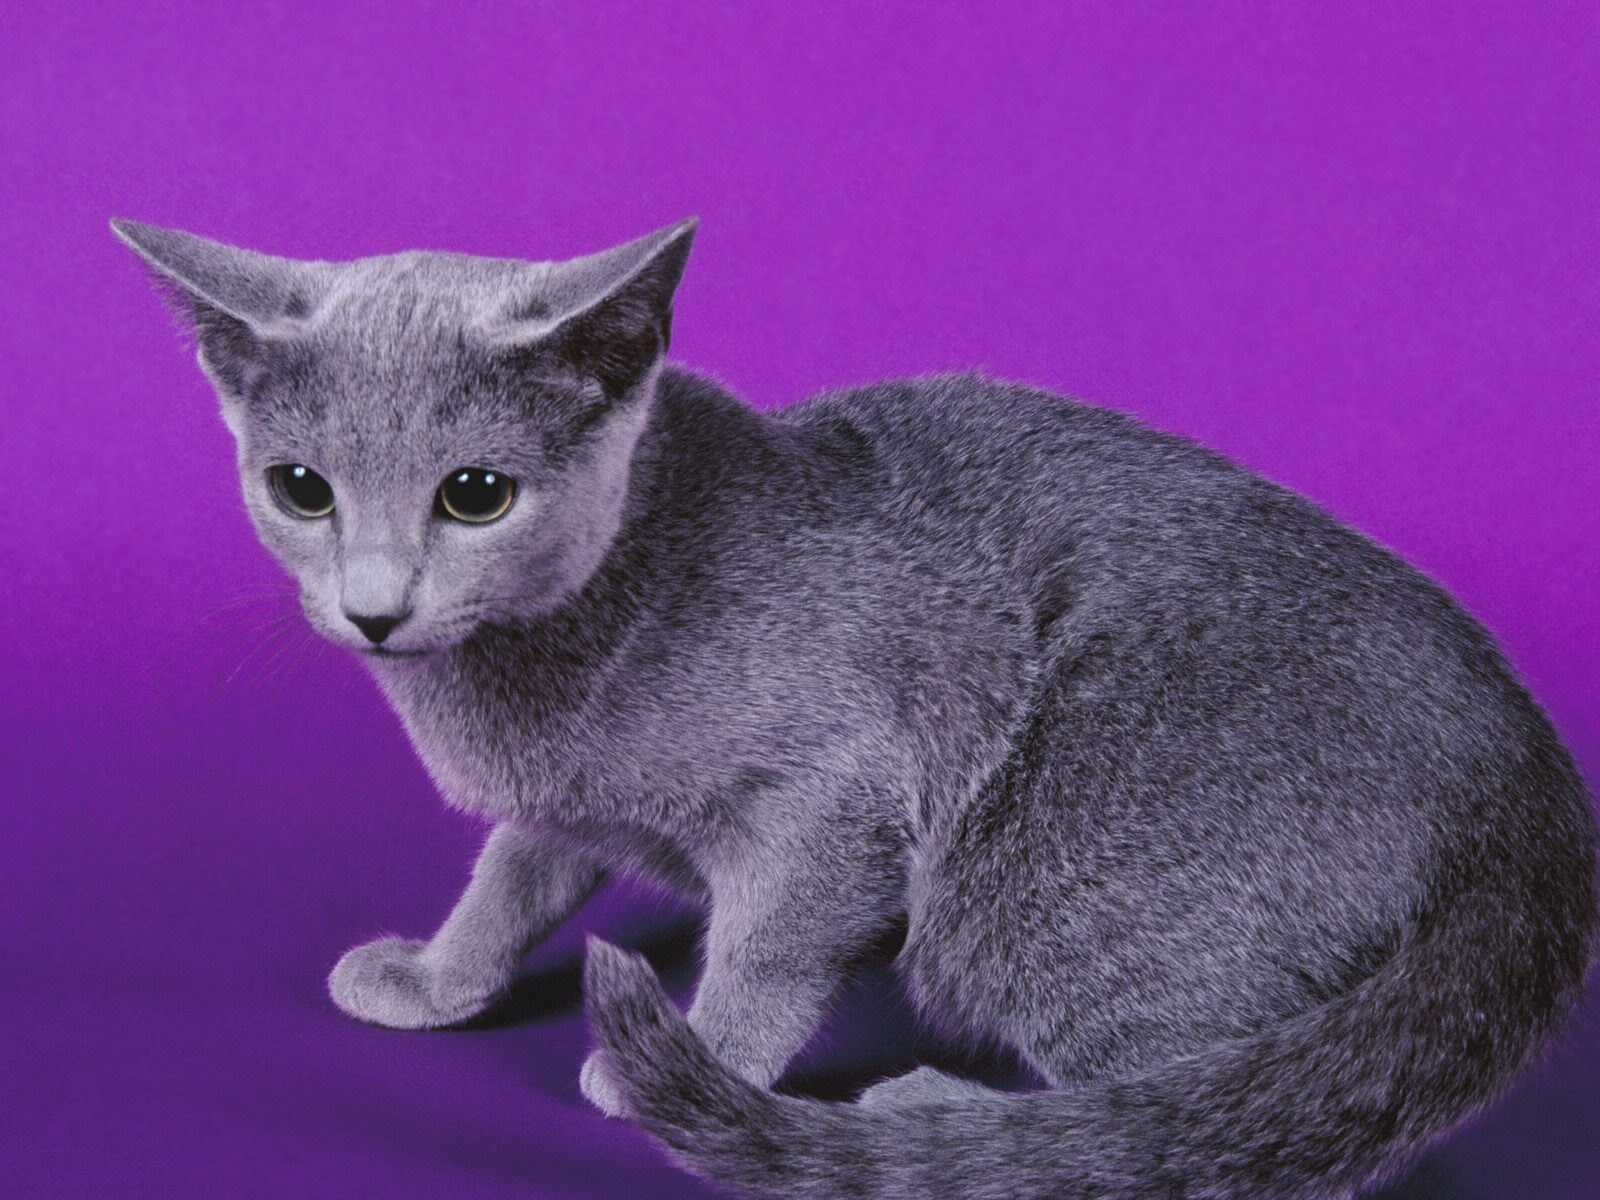 Wallpapers Hd Iphone 7 Gatos Cats Mascotas Wallpapers Fondos De Pantalla Hd